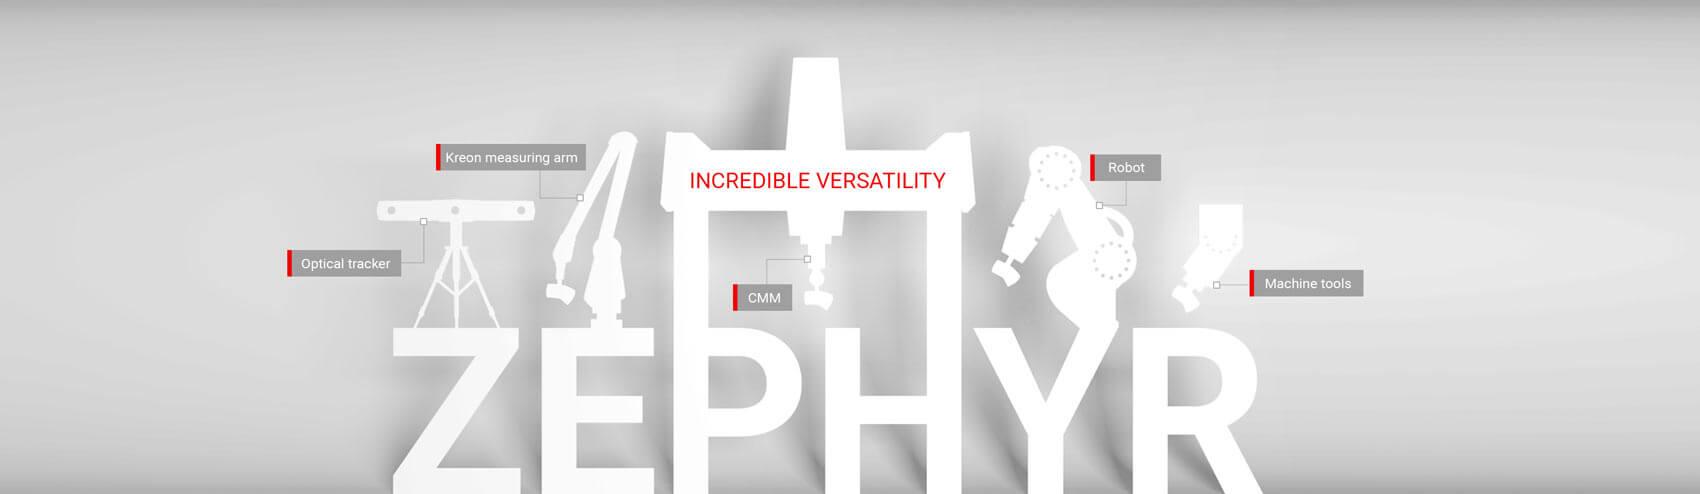 ZephyrIIIversatility